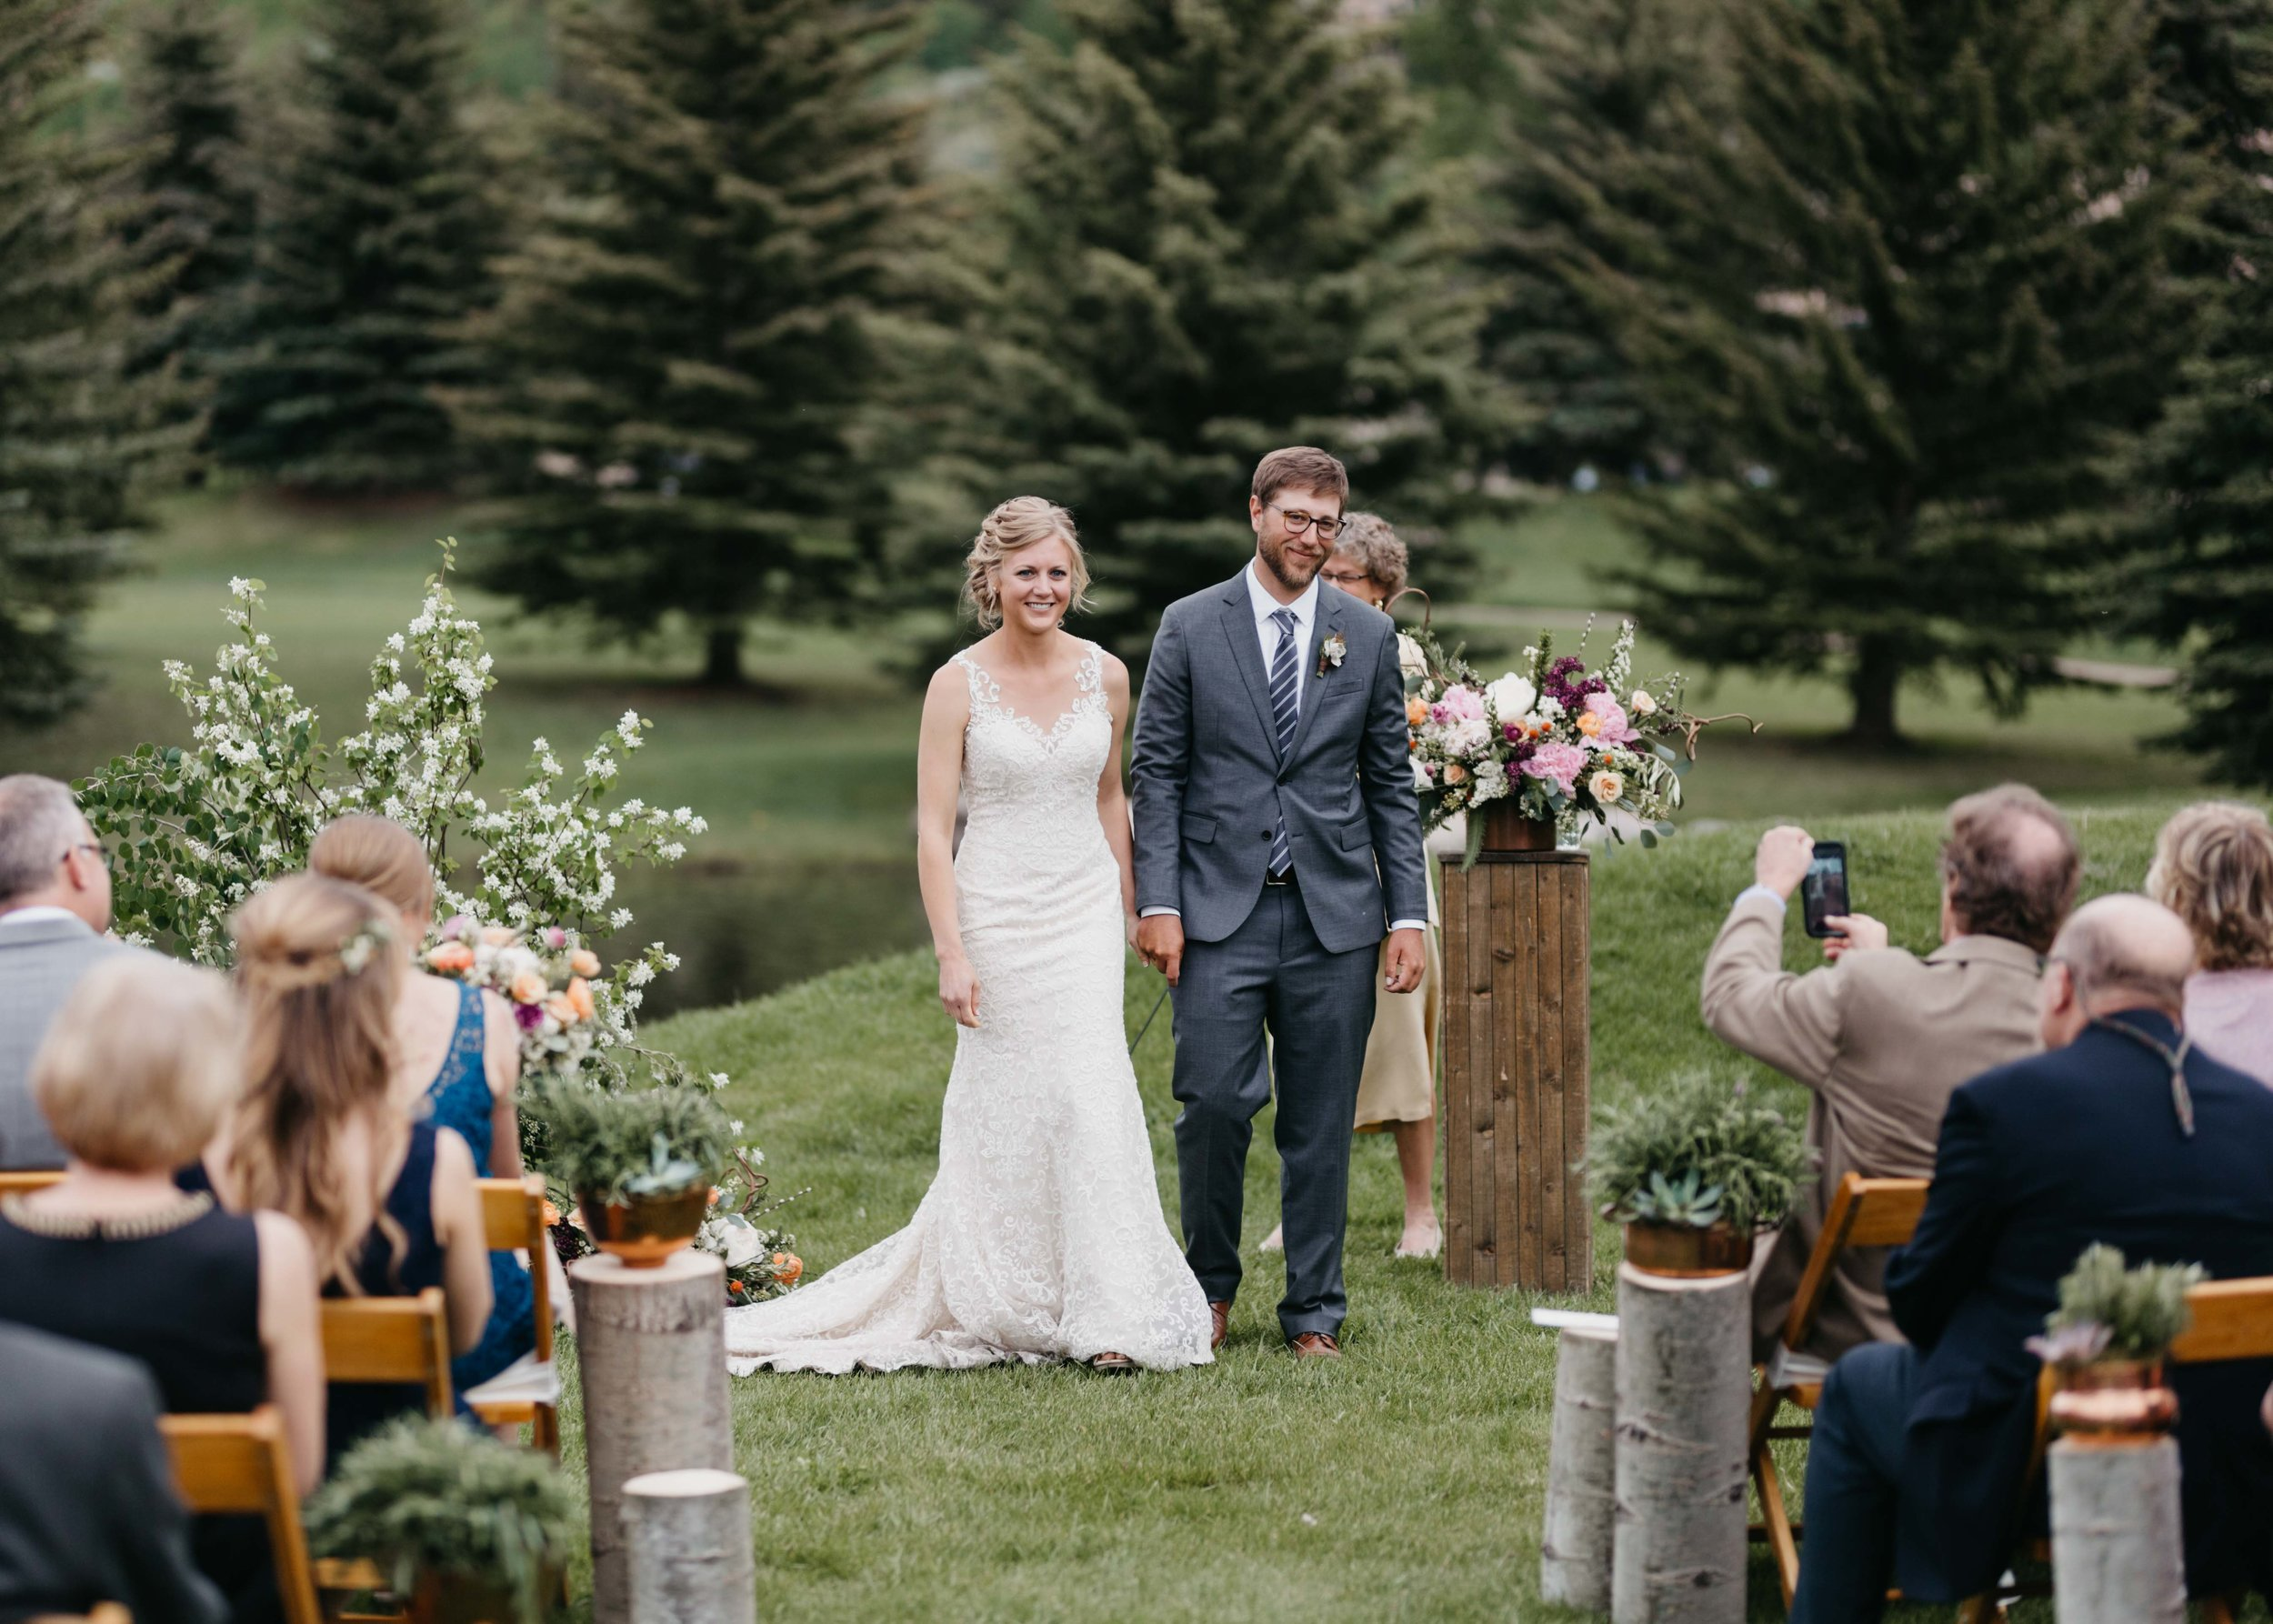 Colorado-Wedding-Photographer-65.jpg